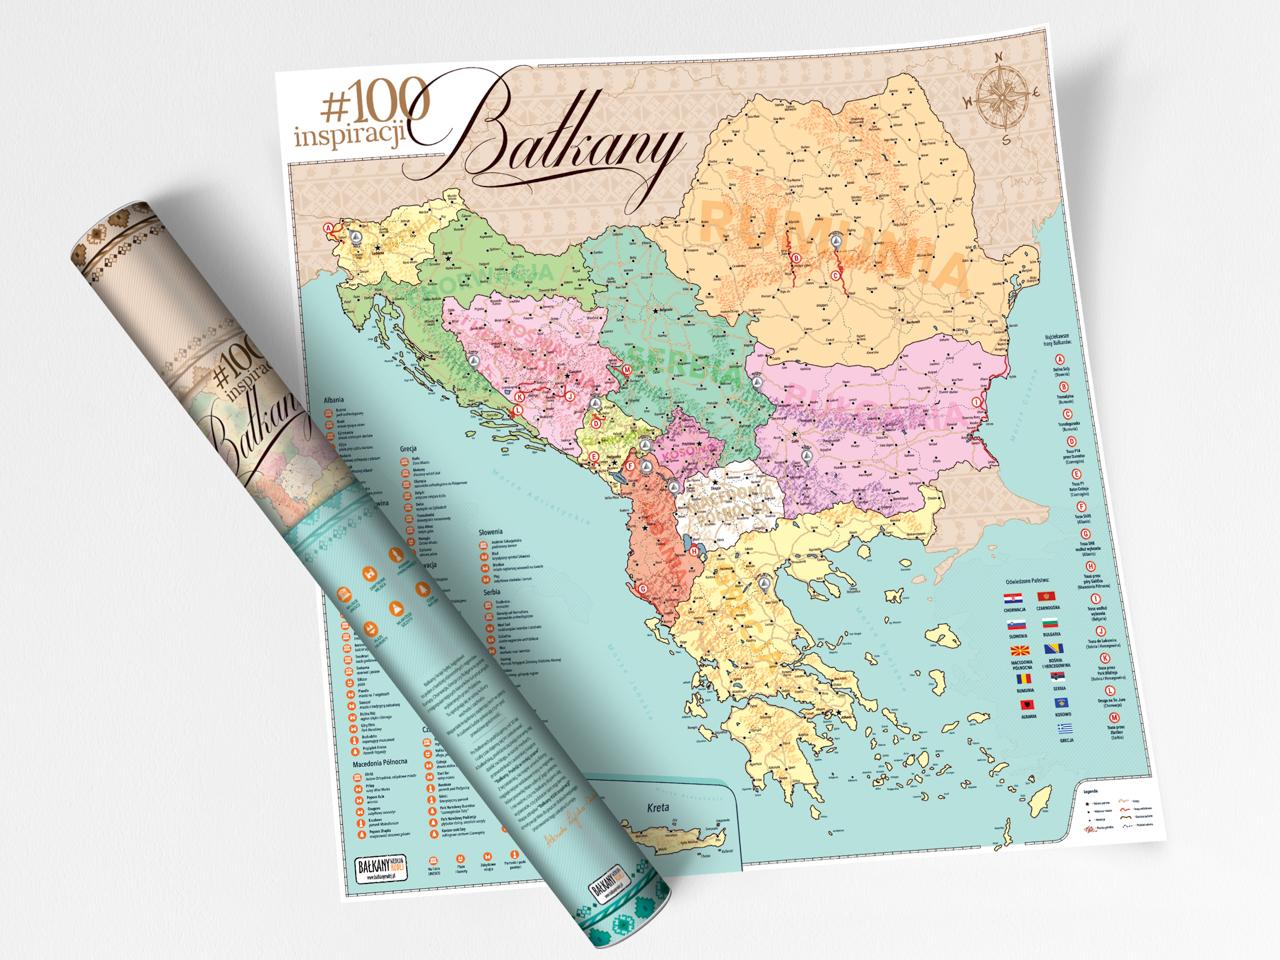 mapa zdrapka bałkany